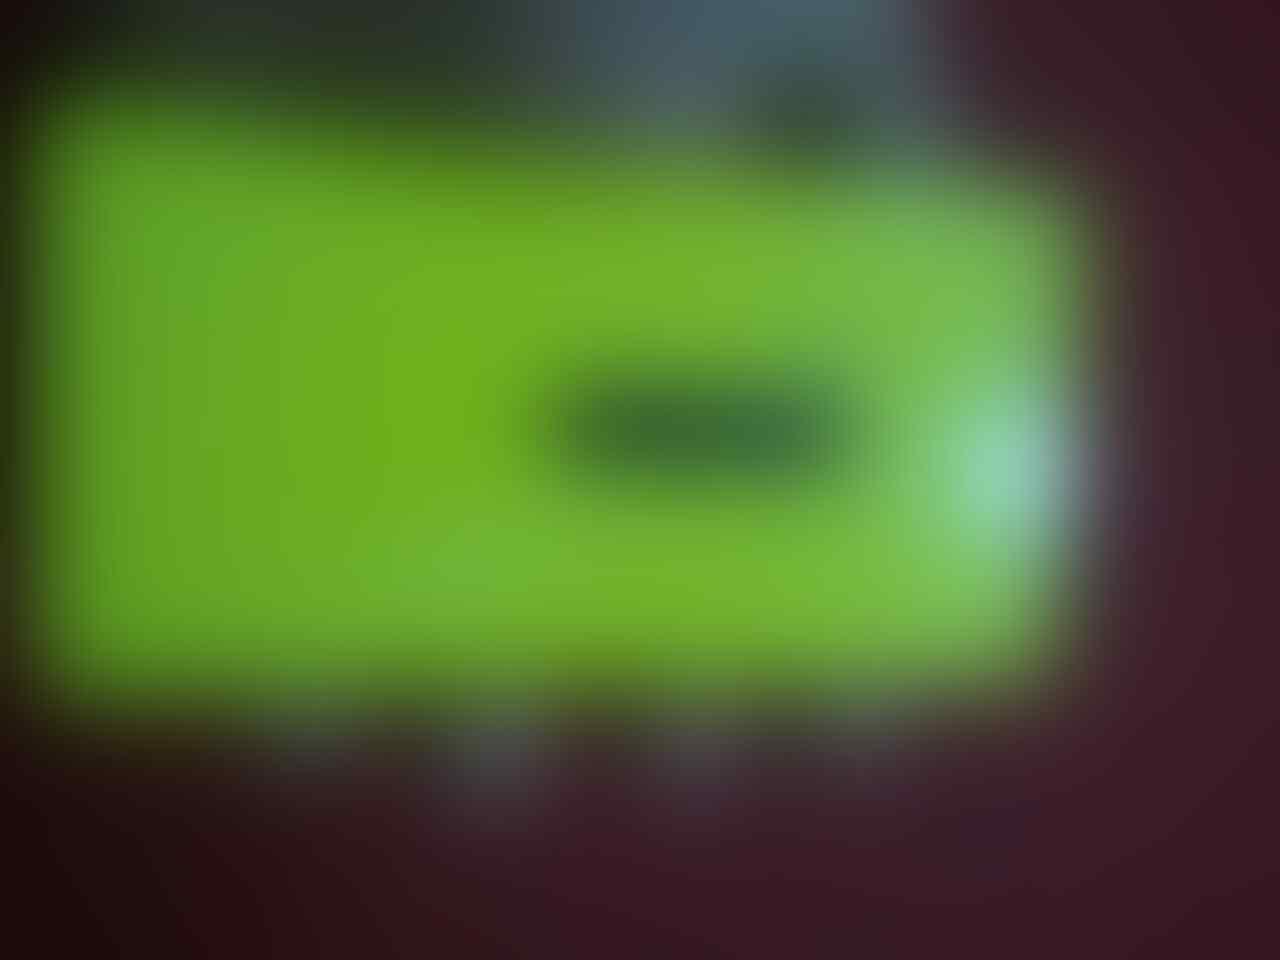 WTS Nokia Lumia 920 Fullset Mulus Warna Kuning MURAHH CEK SENDIRI DAHH